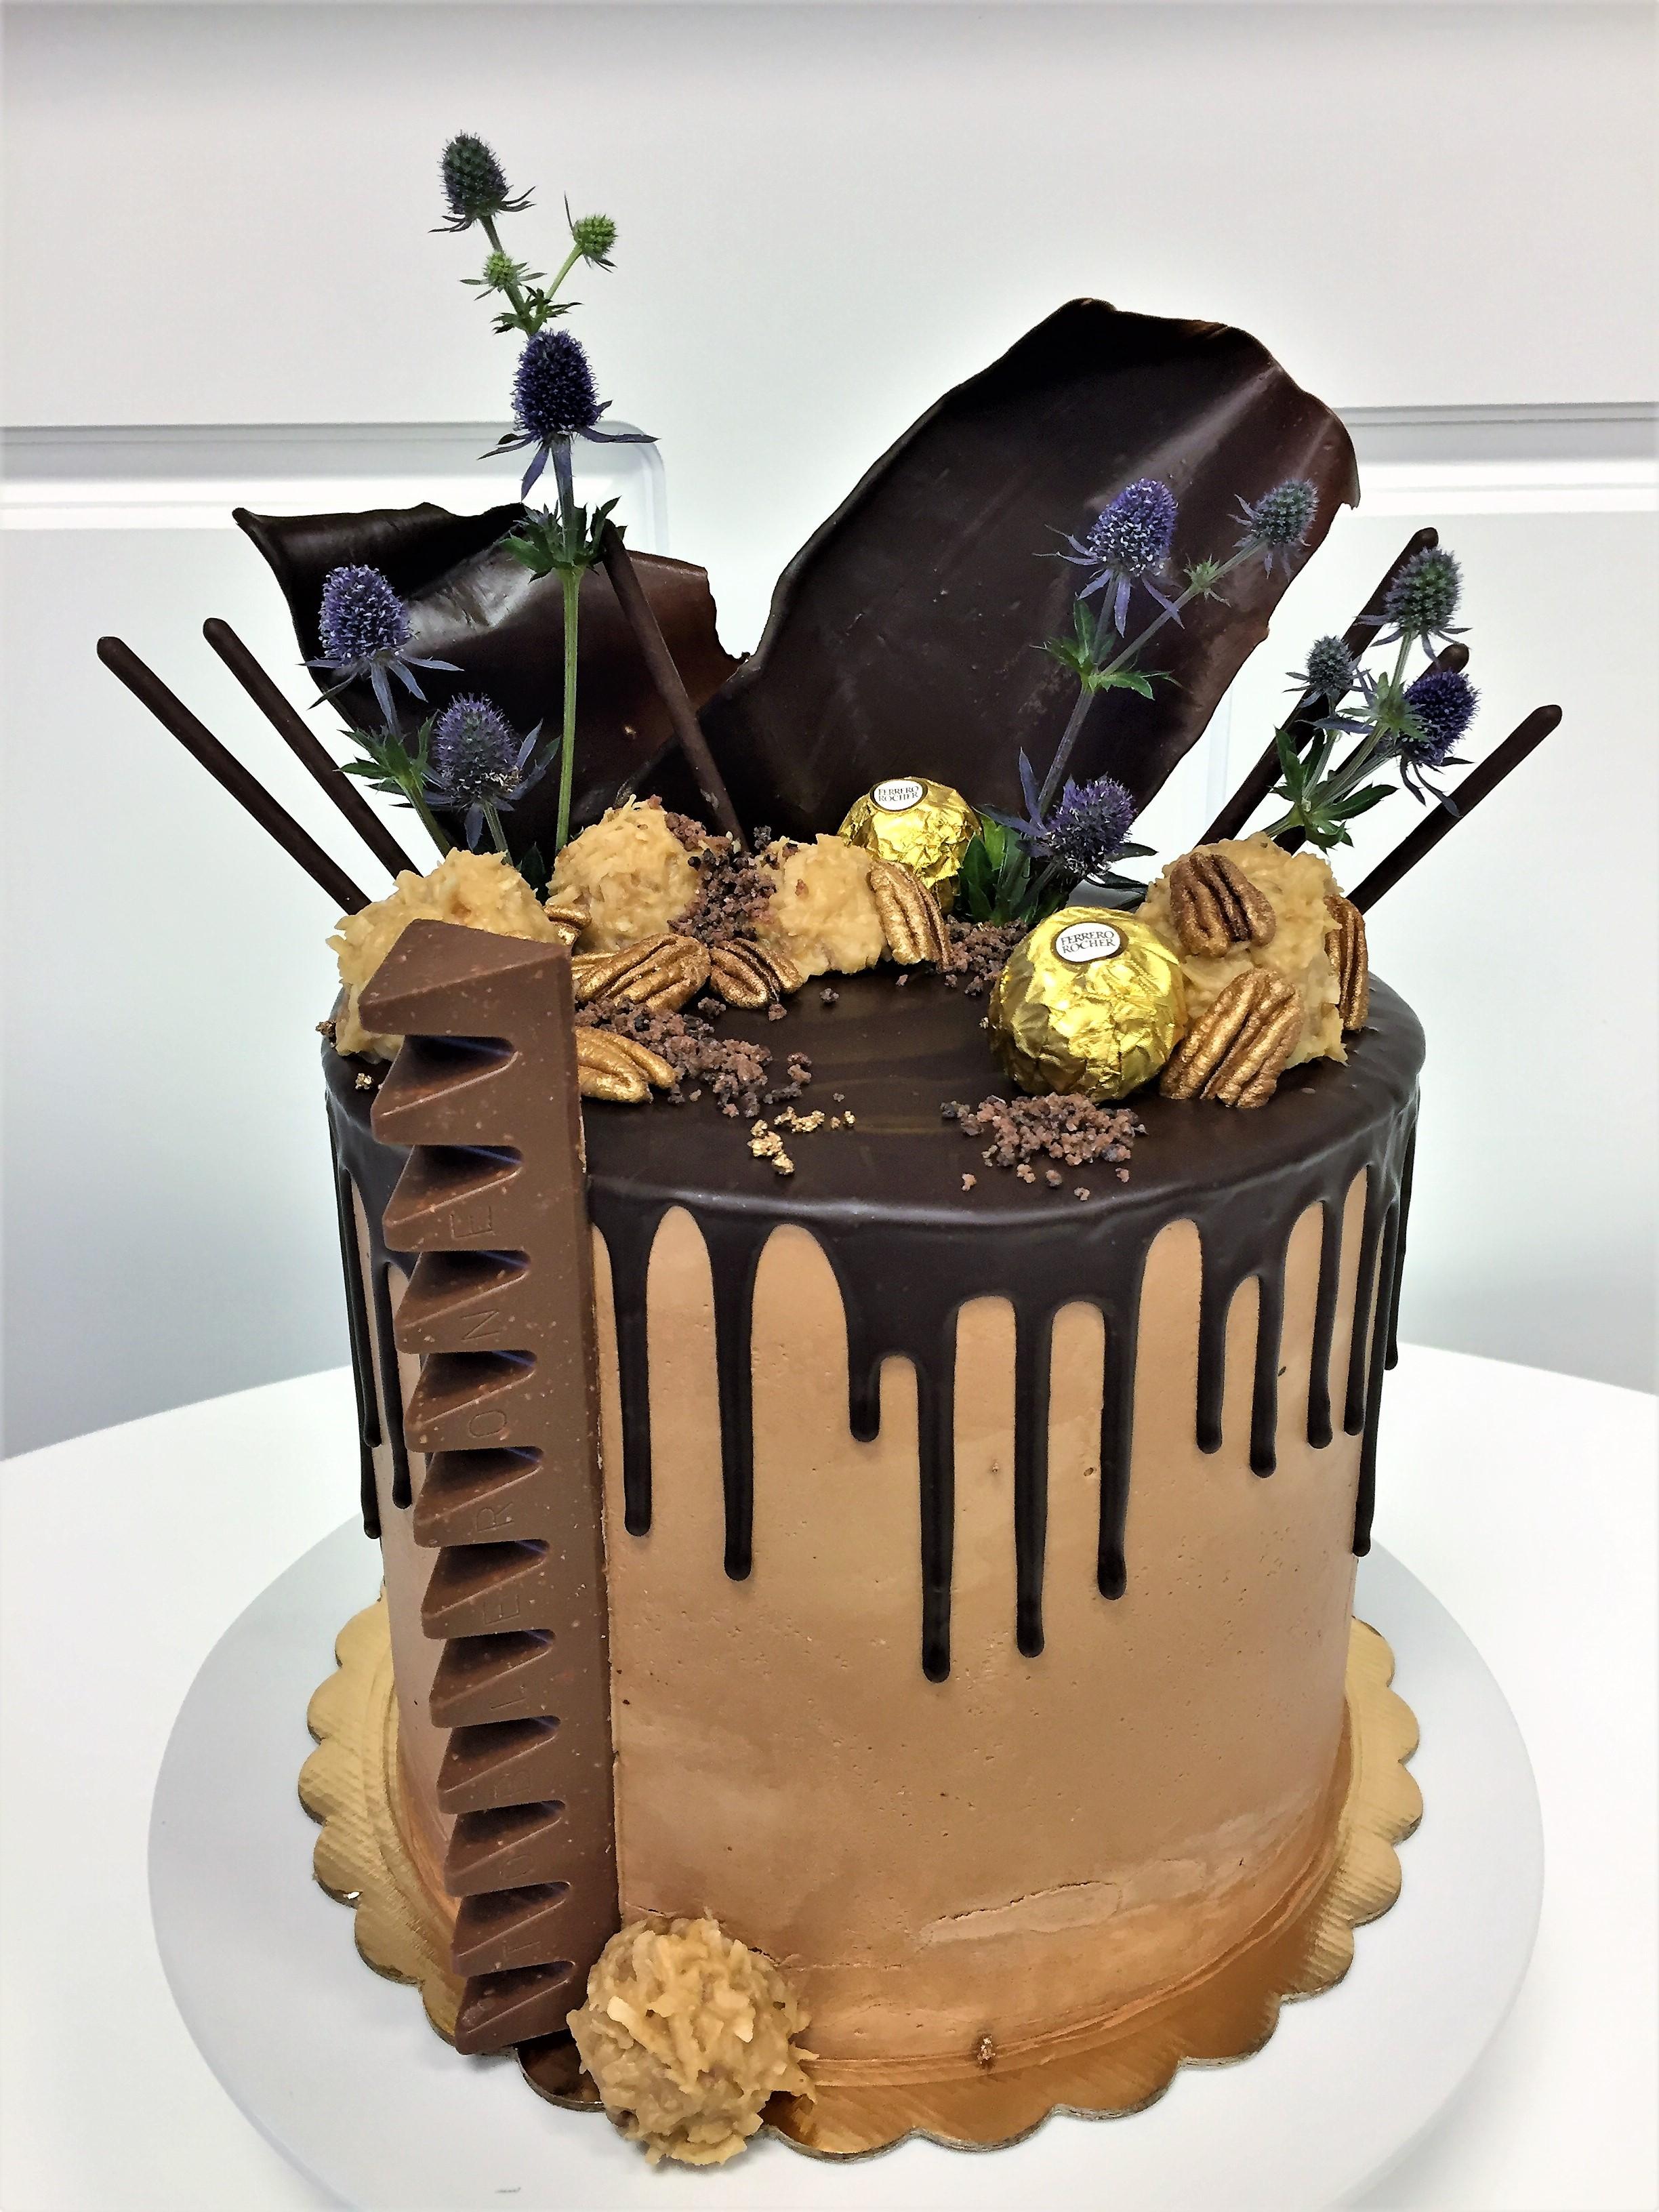 8'' chocolate cake